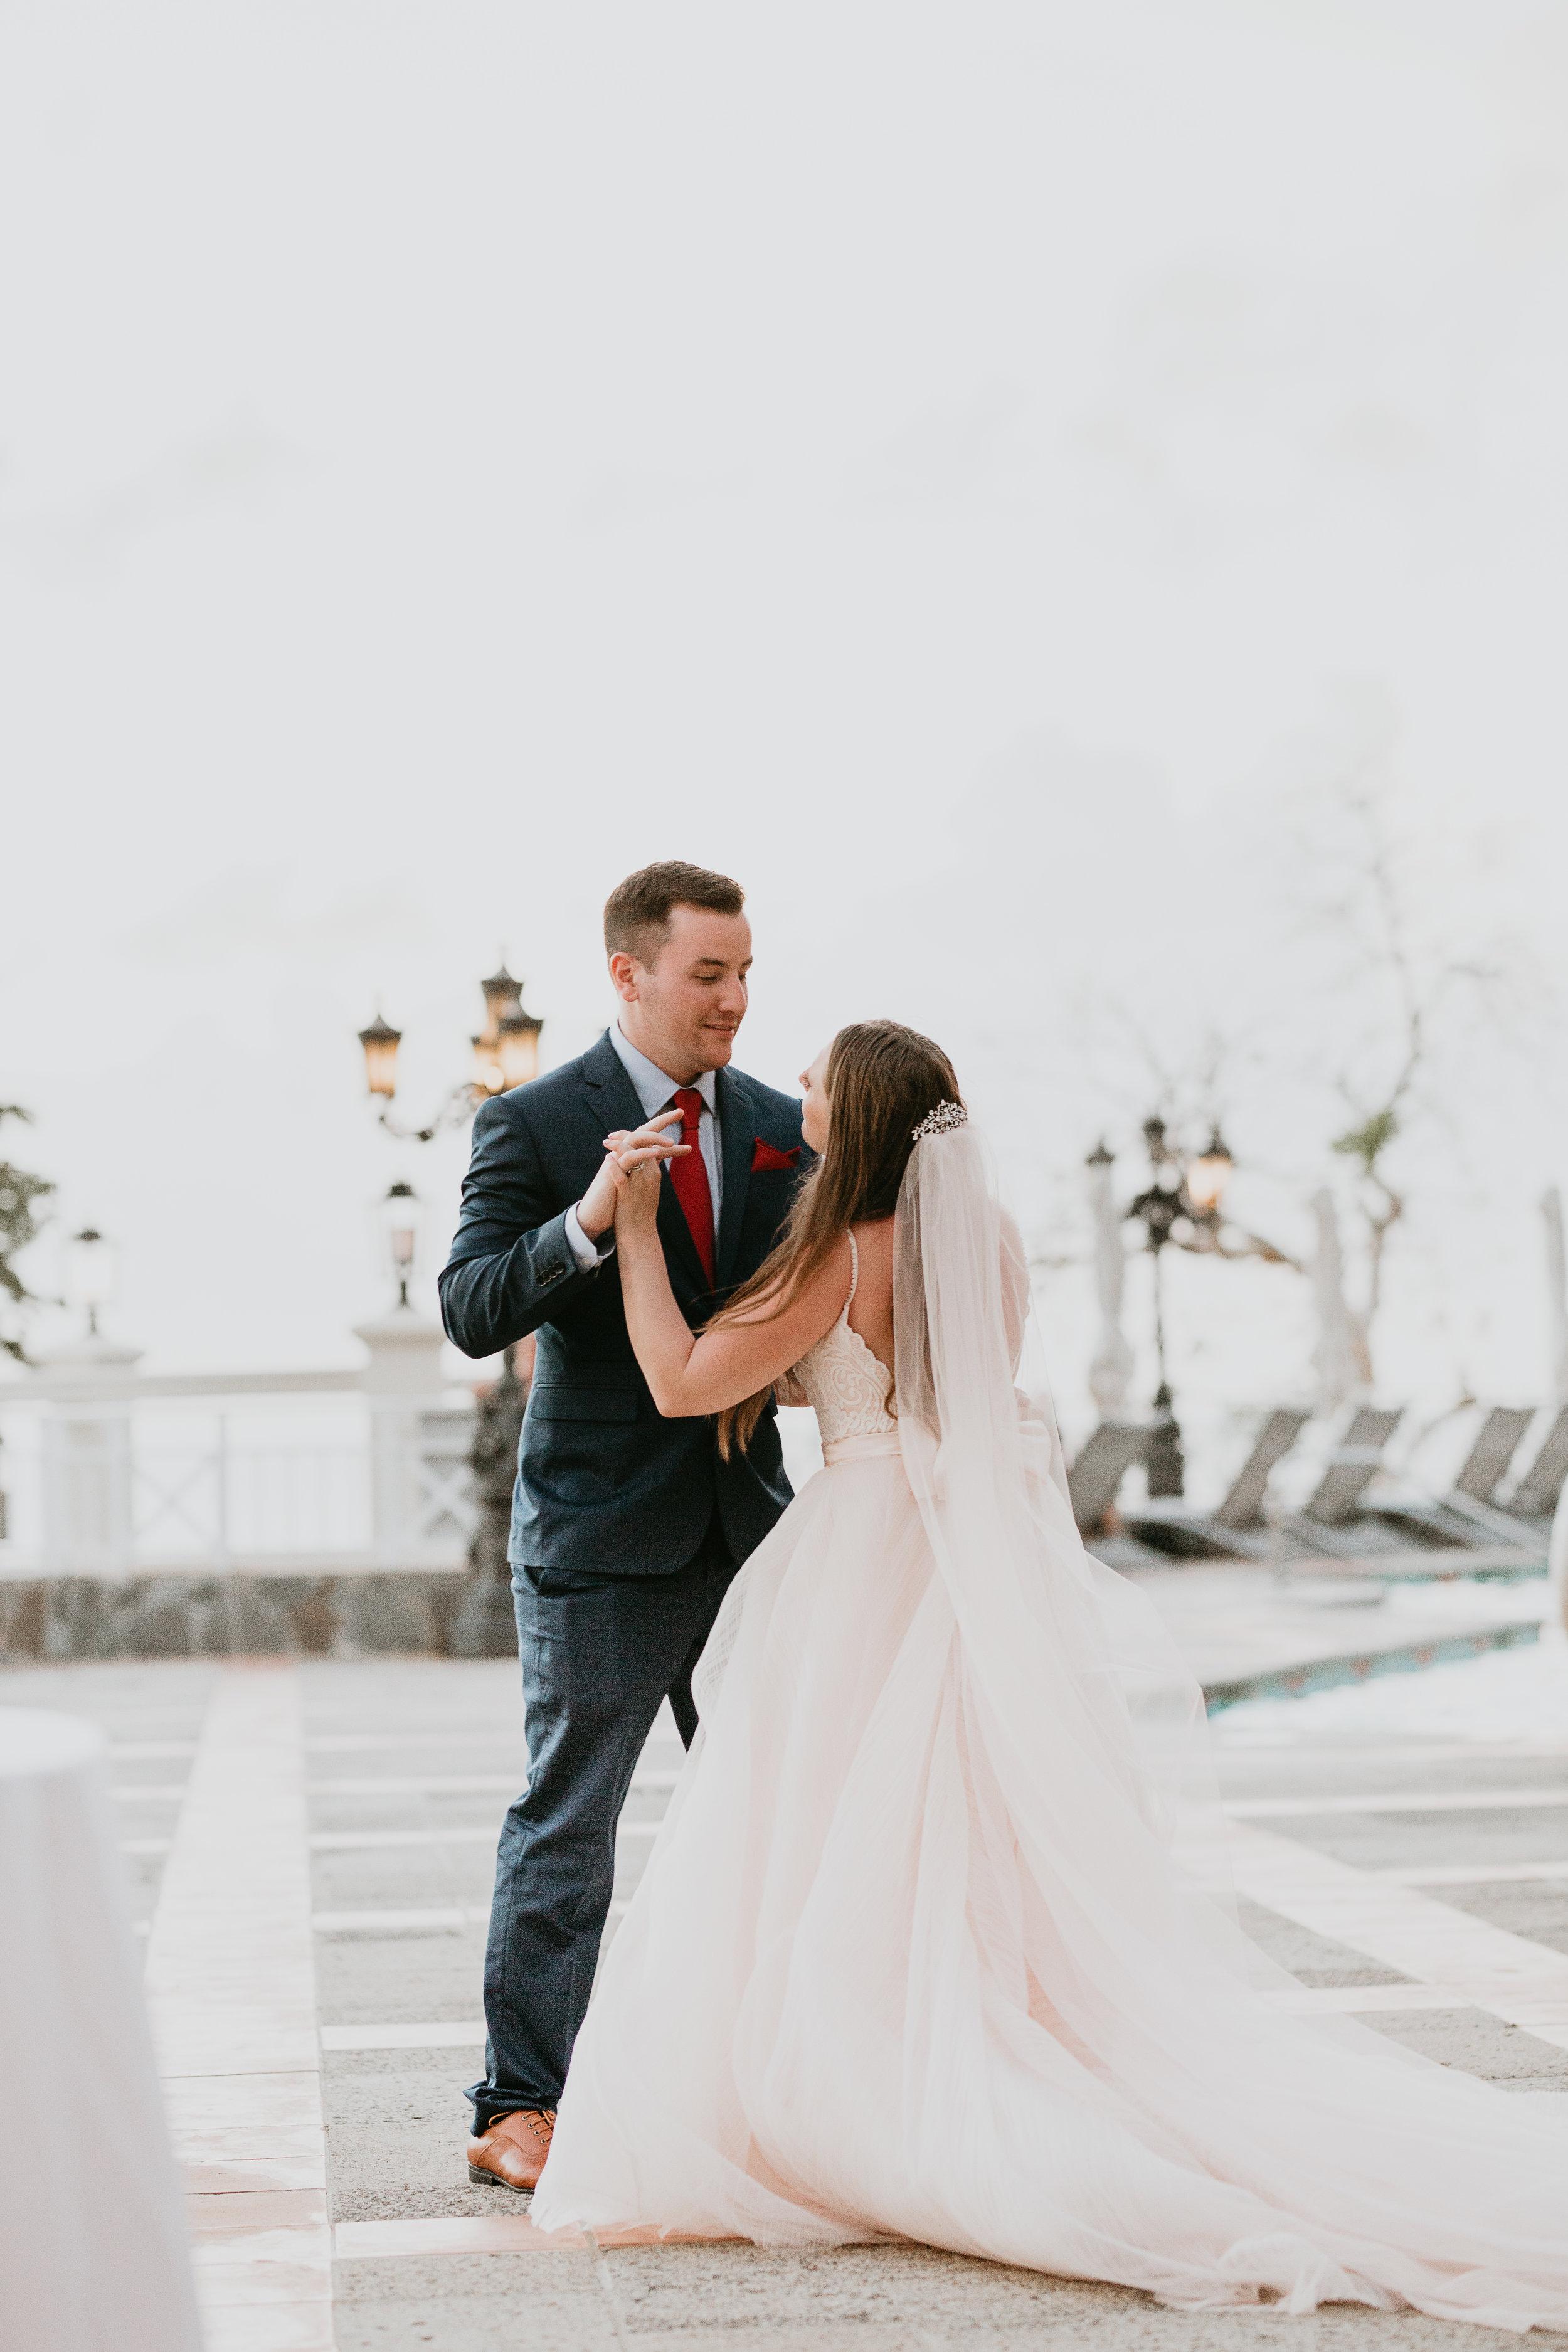 nicole-daacke-photography-destination-wedding-in-st-lucia-sandals-la-toc-intimate-island-wedding-carribean-elopement-photographer-chill-island-wedding-130.jpg